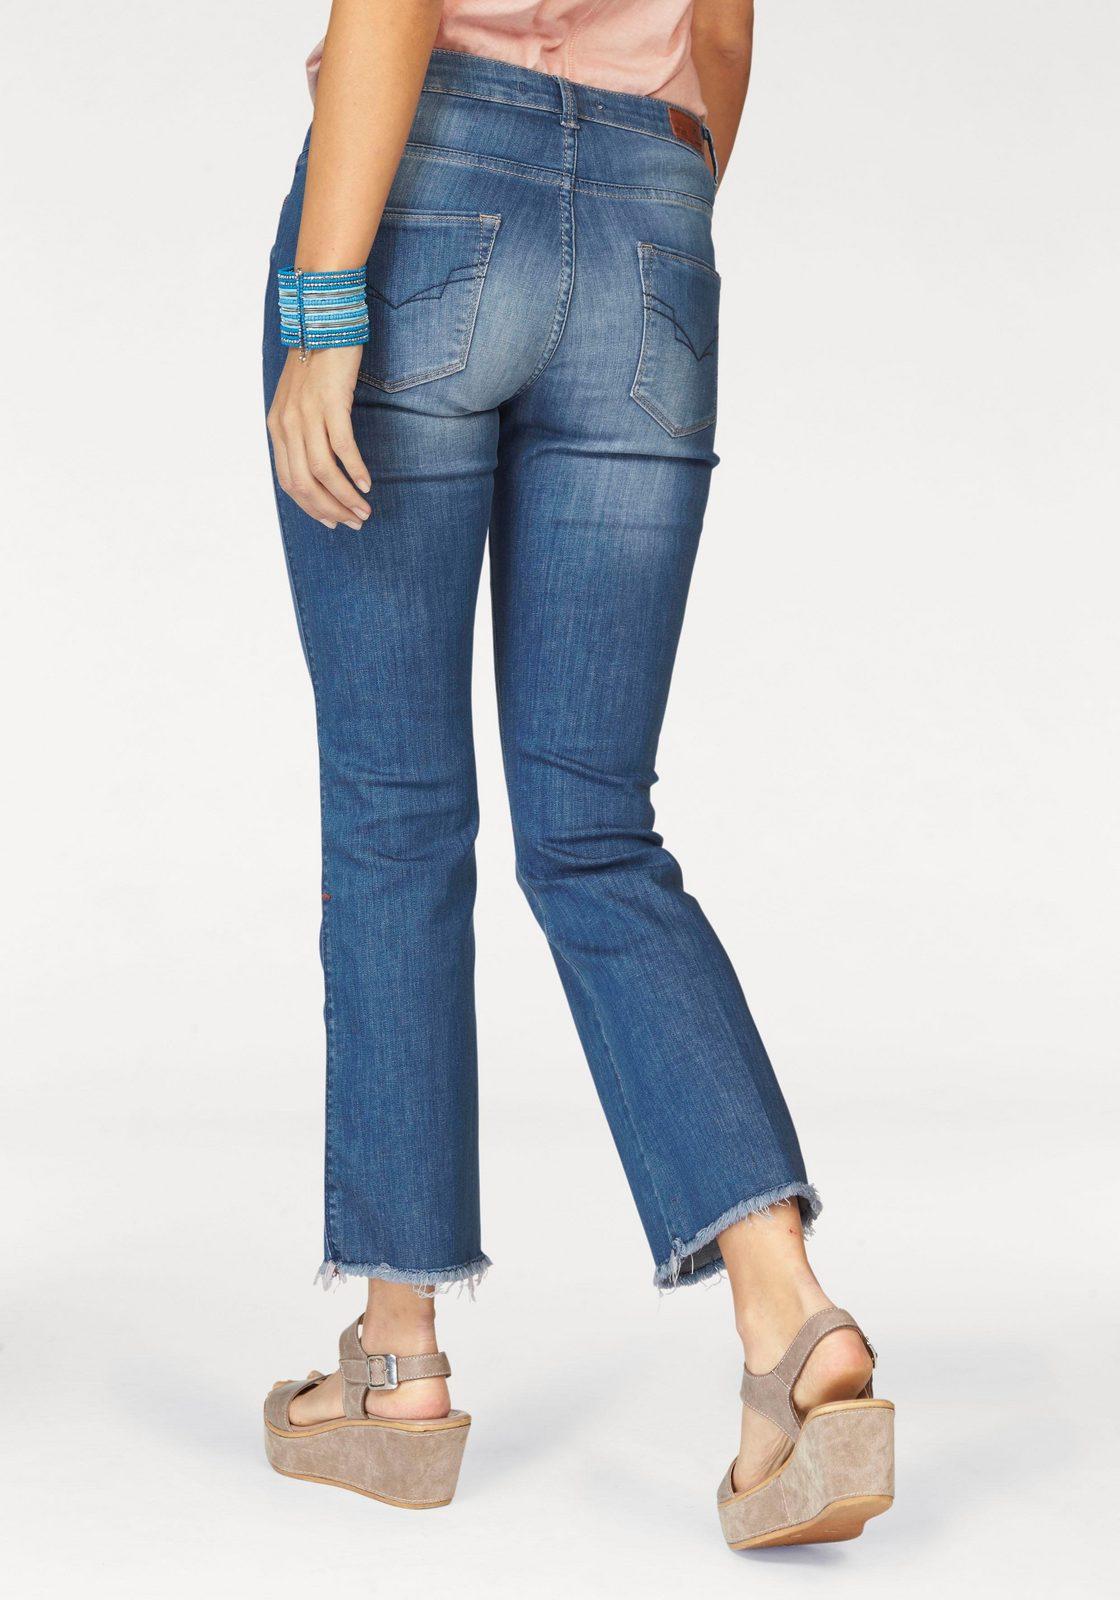 H.I.S Bootcut-Jeans »Cropped Sunny«, Mit Fransen am Saum - broschei